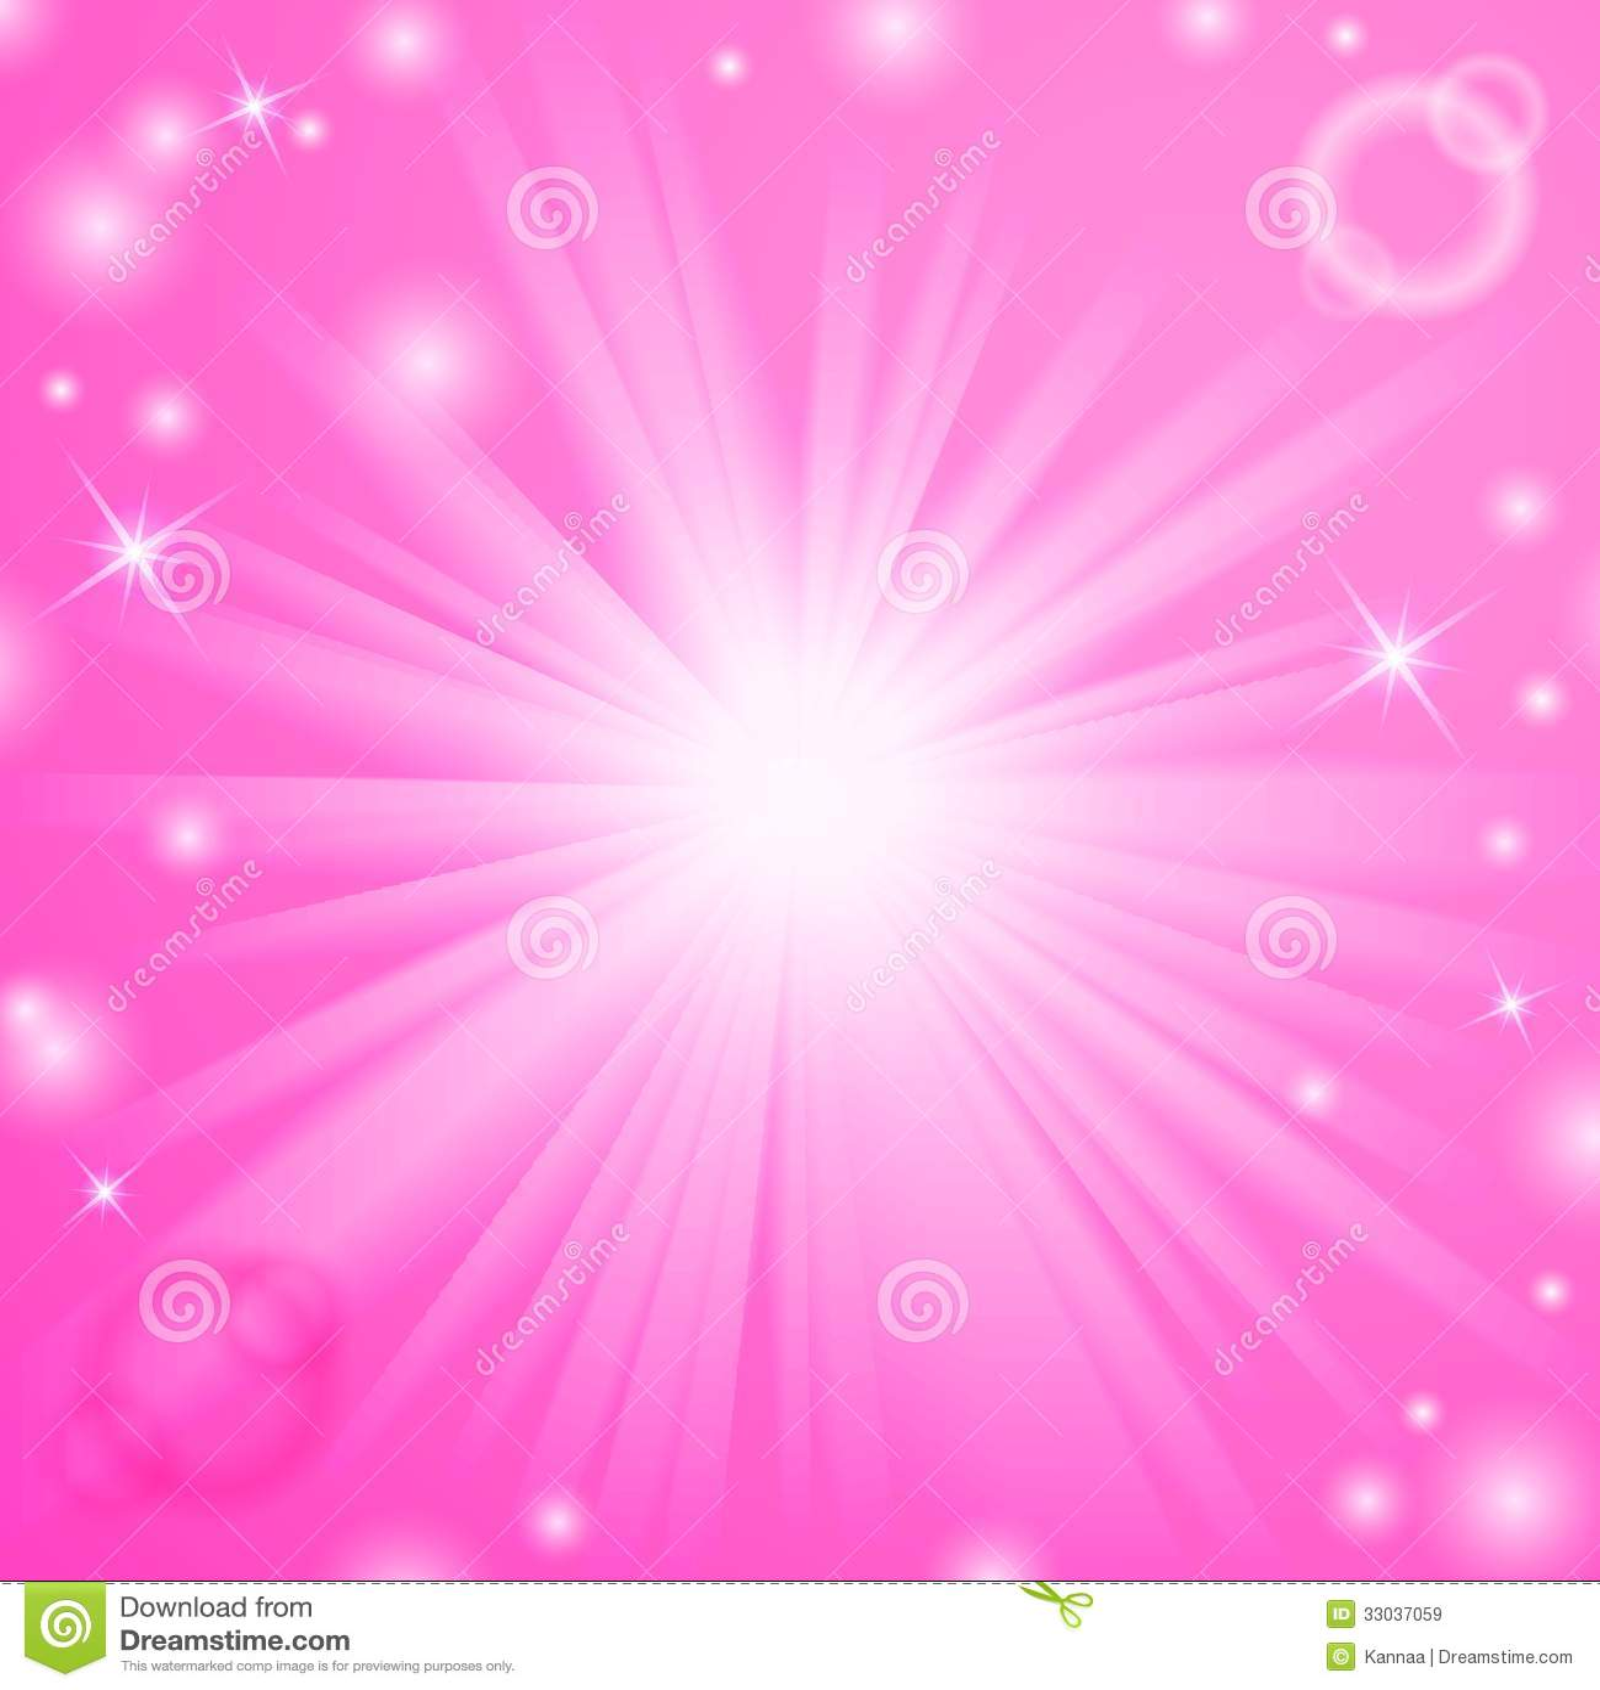 Color Pink Background